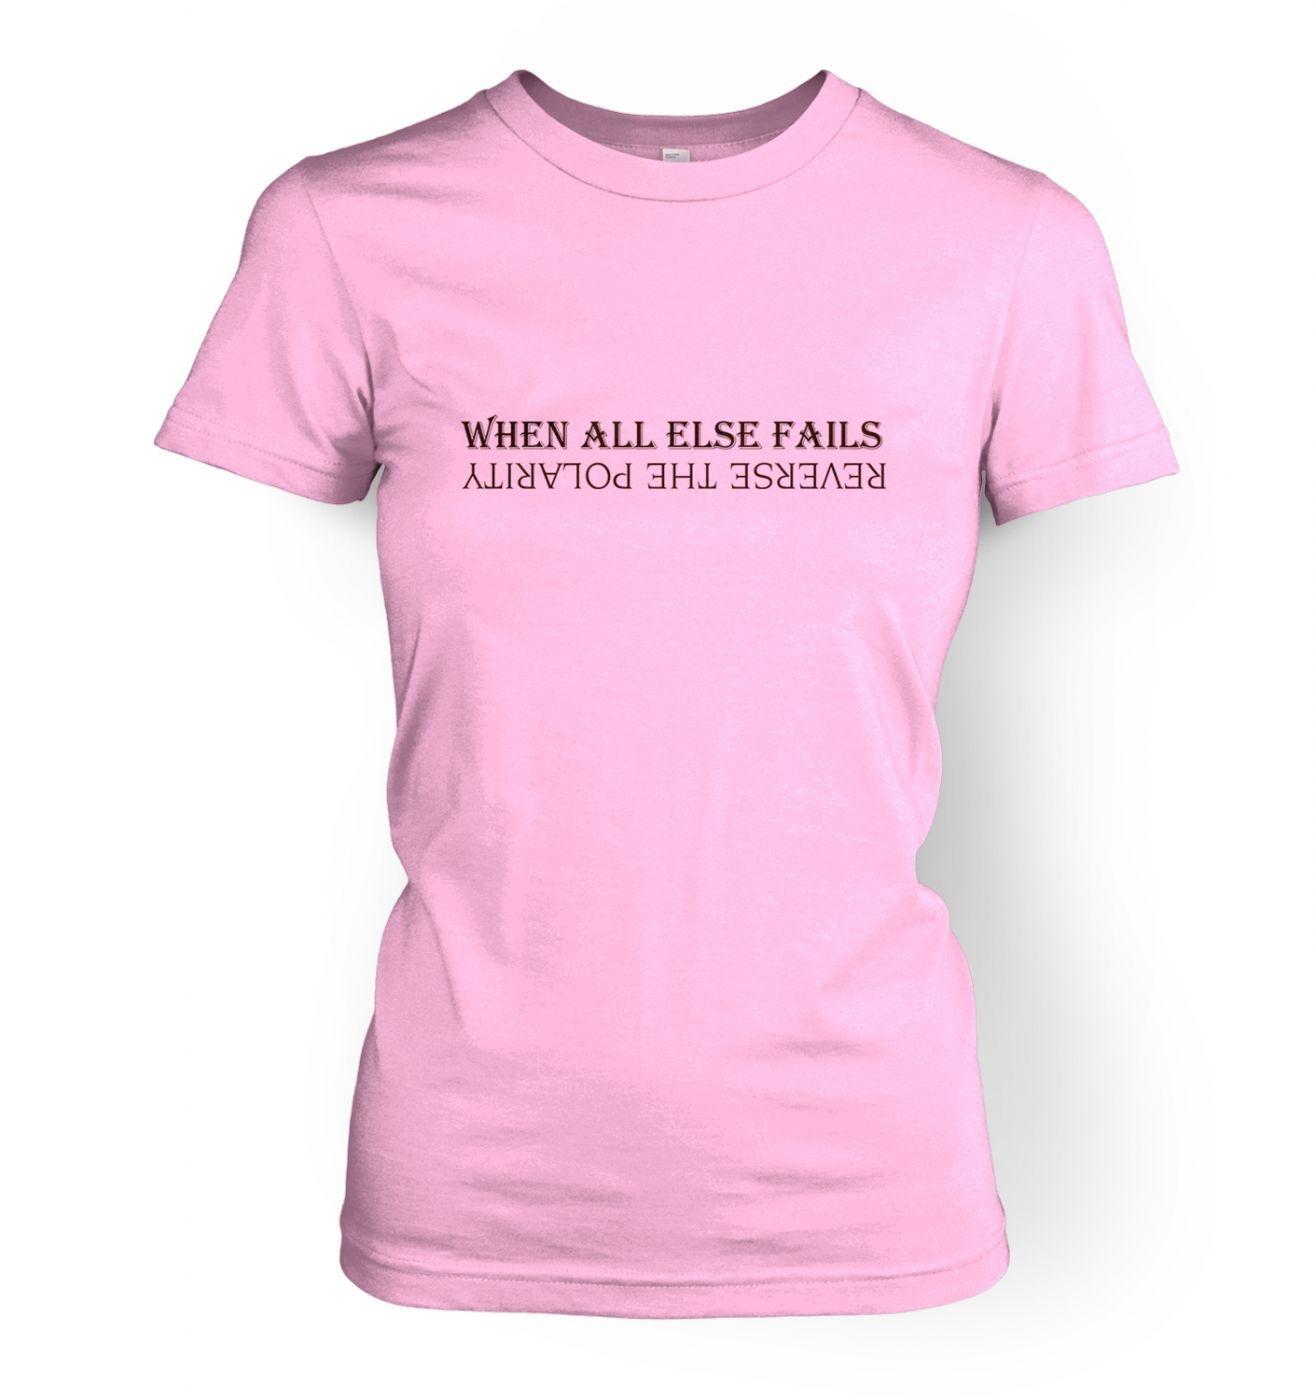 Reverse The Polarity women's t-shirt